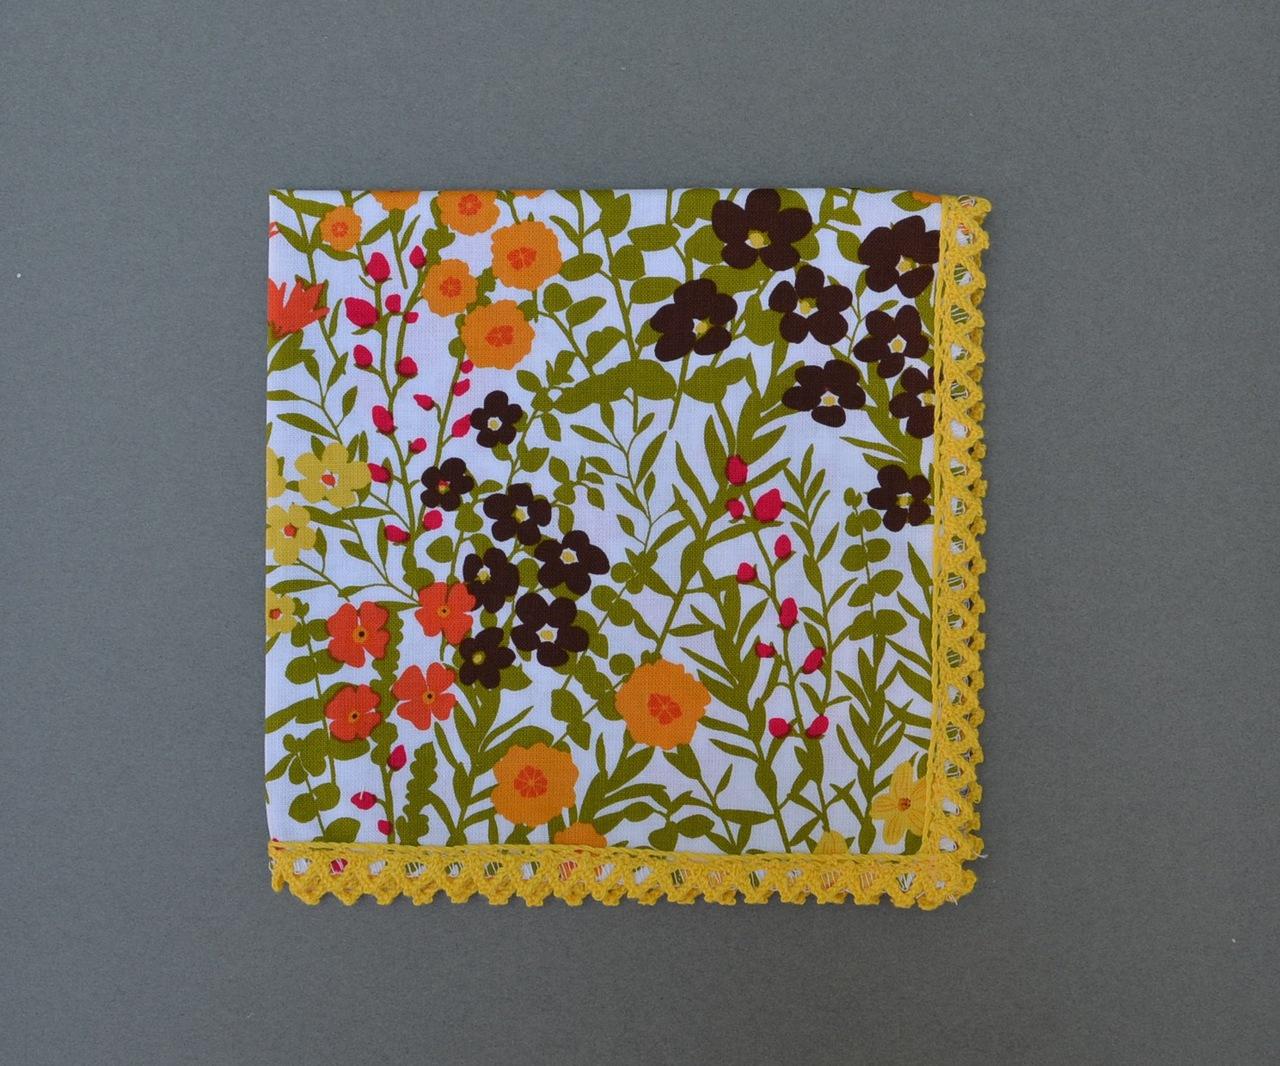 http://www.thehandkerchiefshop.com/flower-fields-floral-hanky-limited-edition/